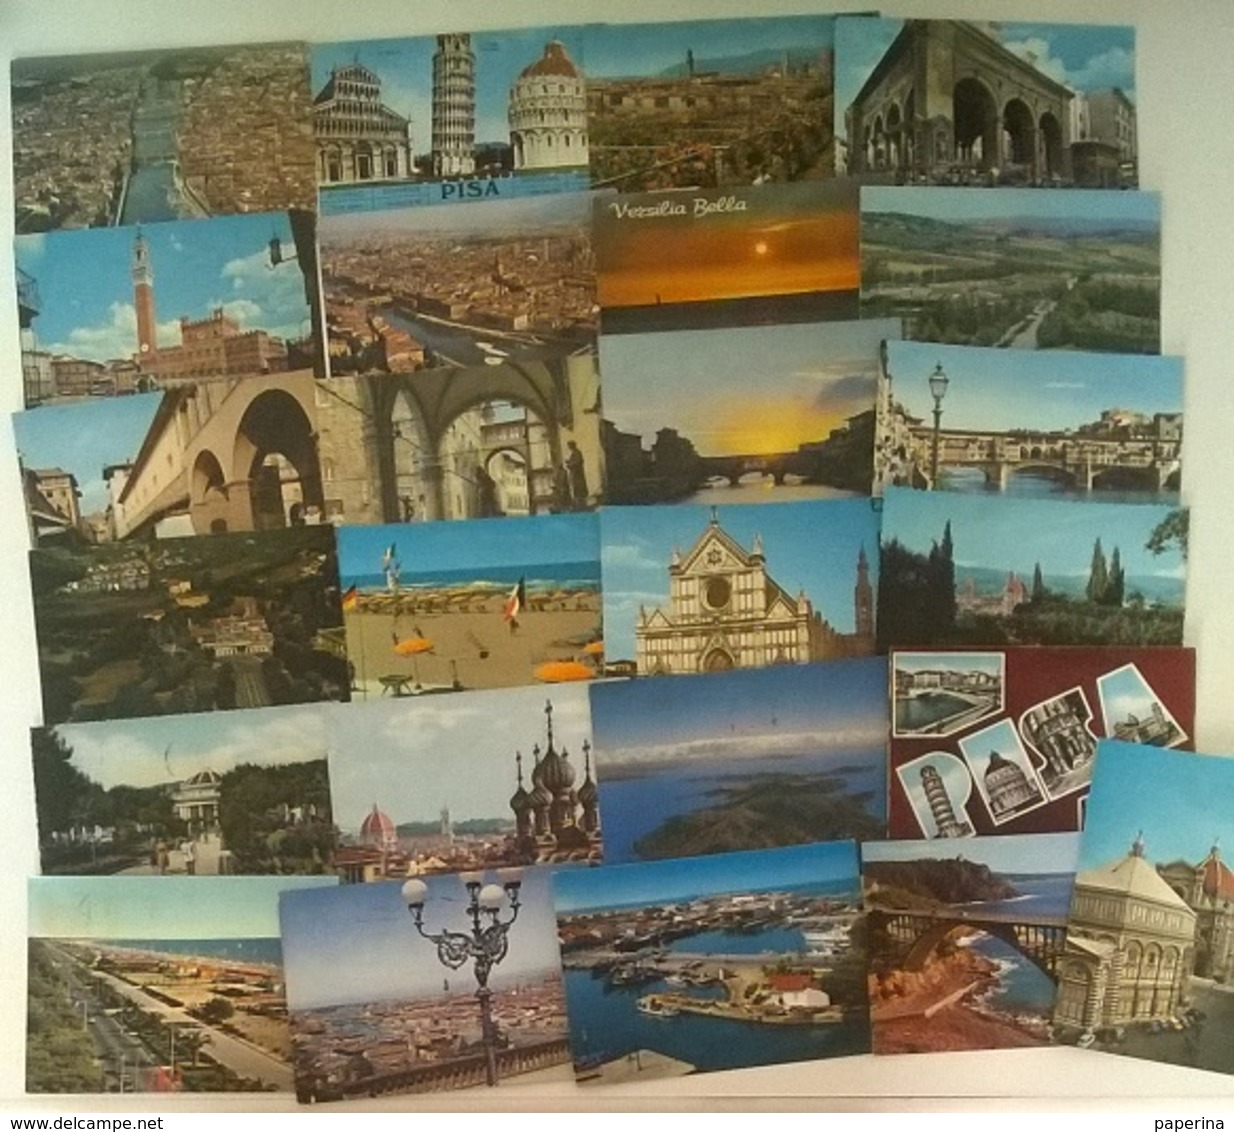 25 CARTOLINE TOSCANA  (6) - Cartoline